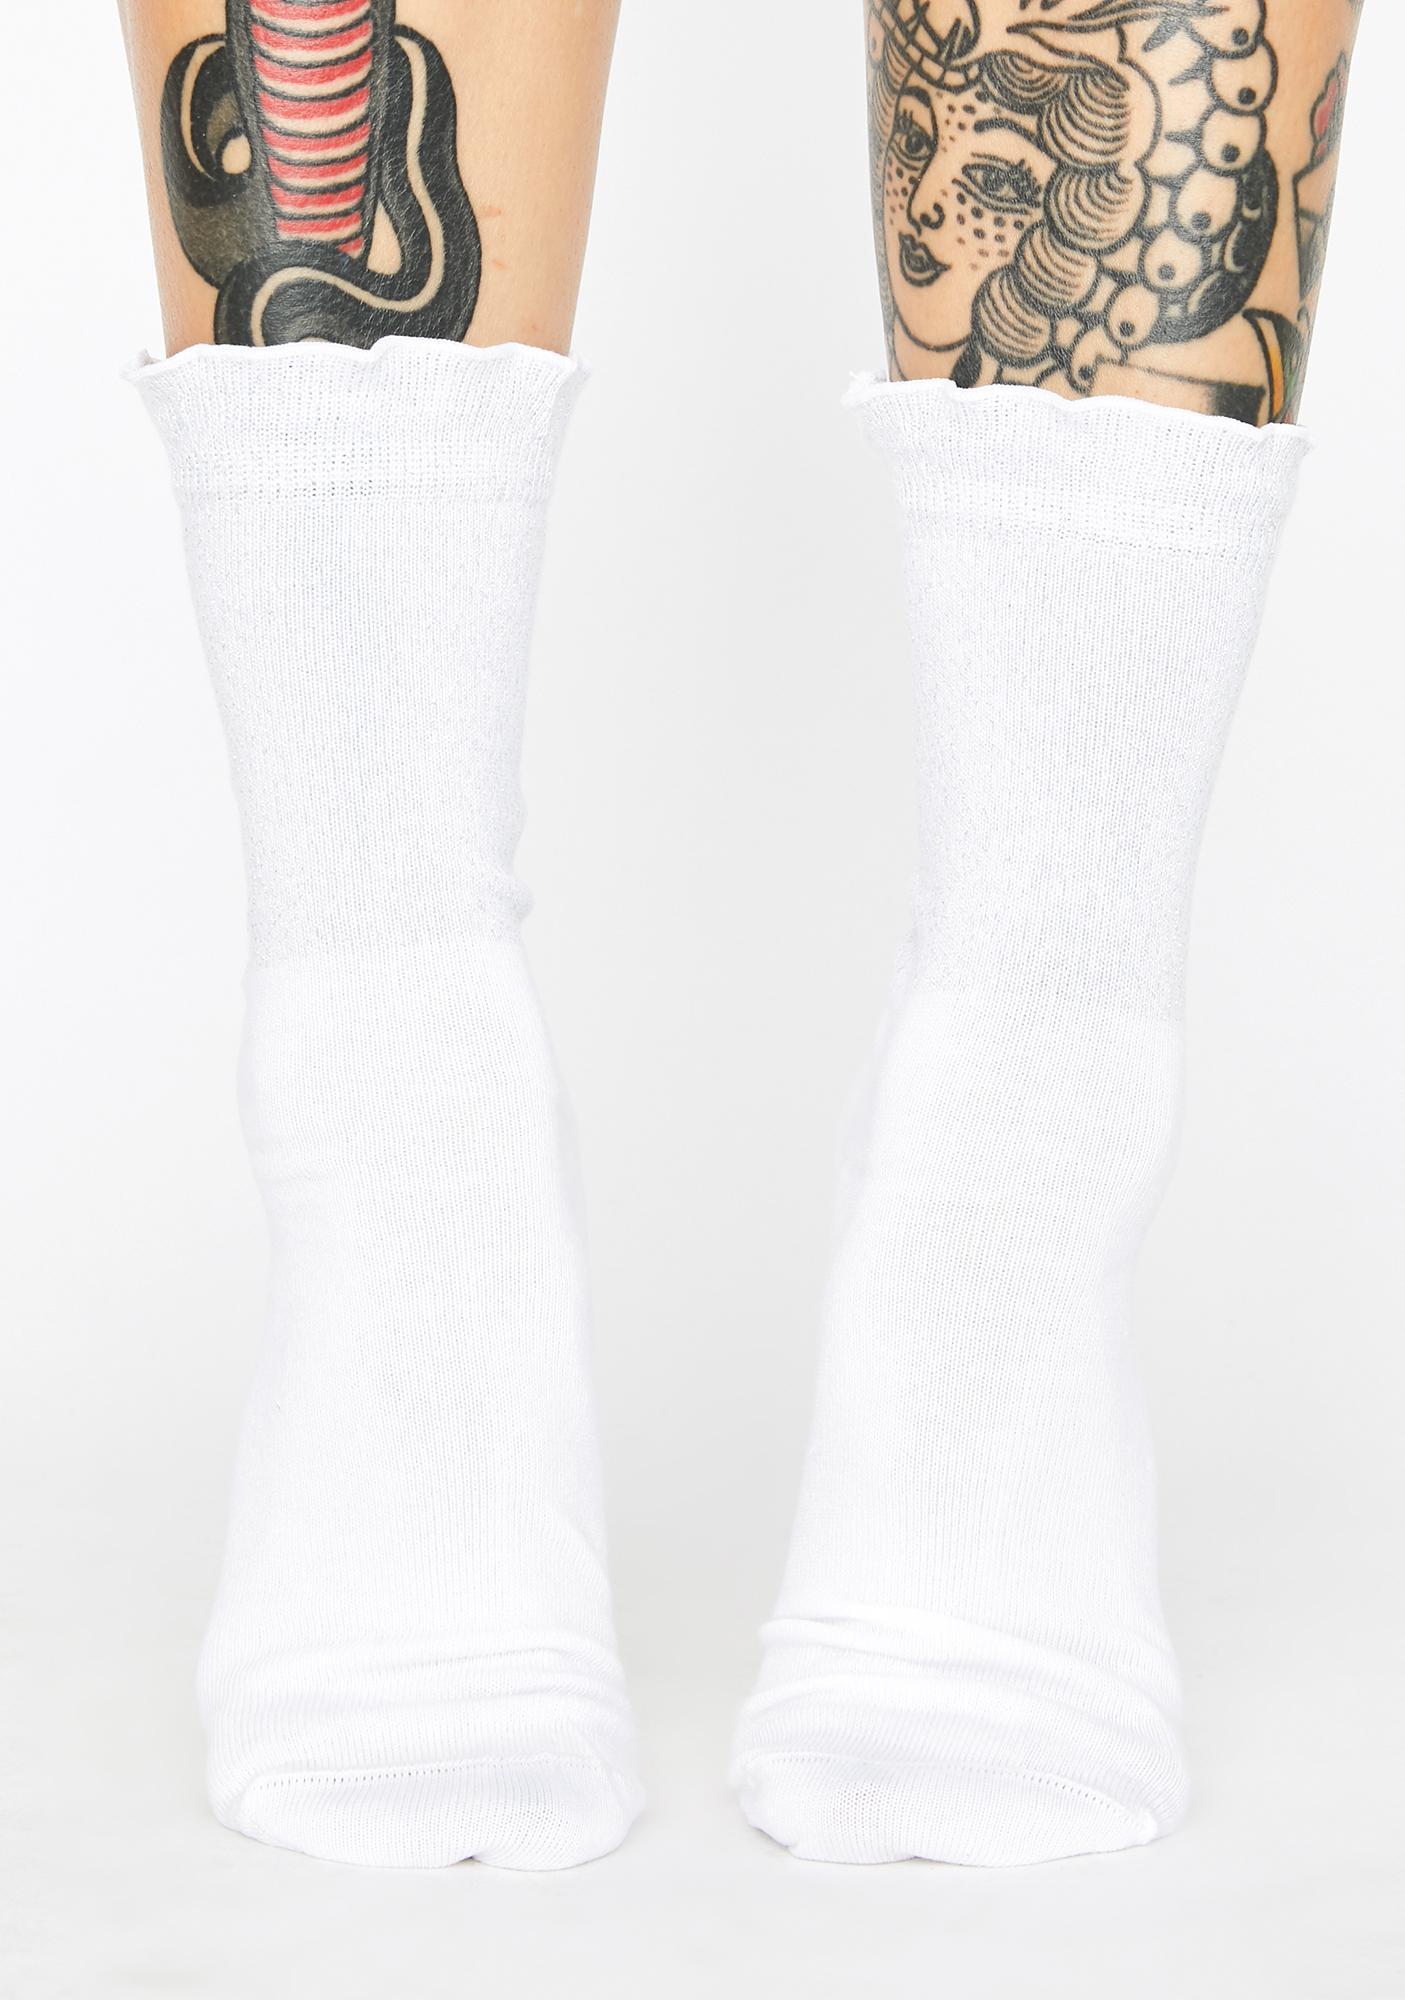 Dr. Martens Silver Iridescent Socks